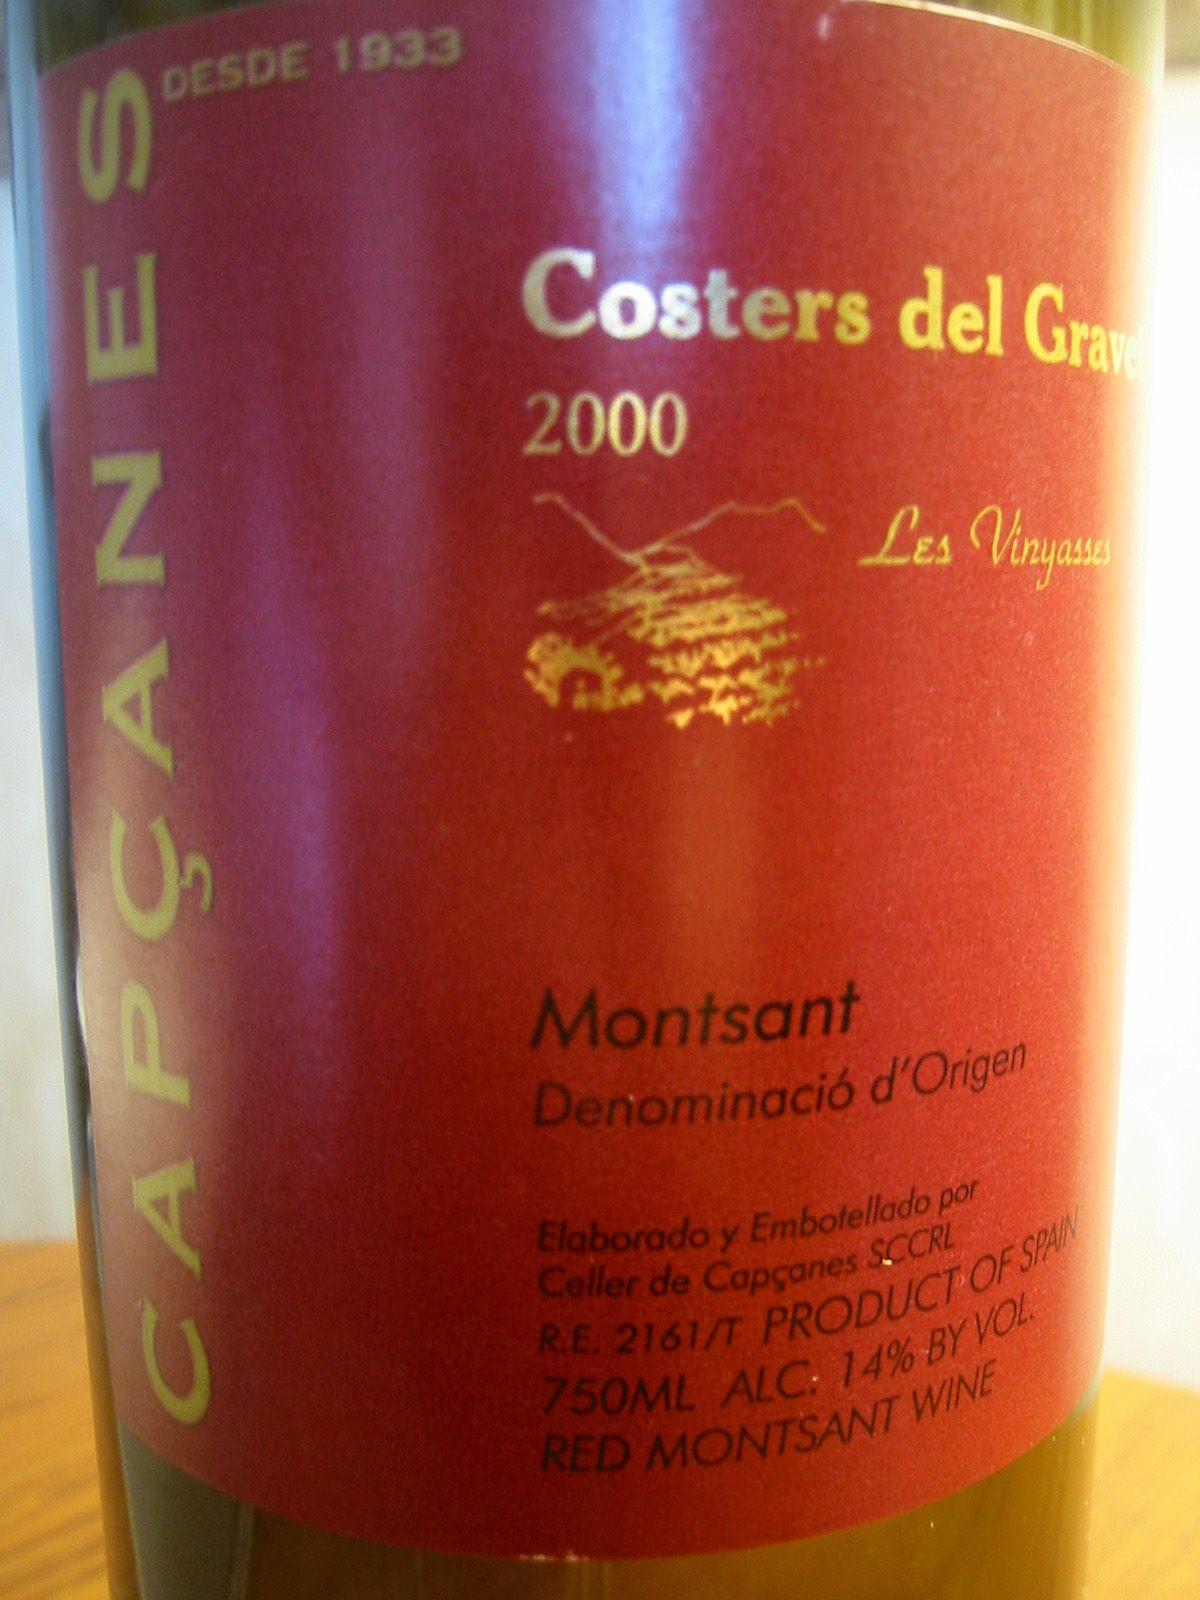 2000 Capcanes Costers Del Gravet Les Vinyasses Montsant Wine Recipes Wine From Spain Whiskey Bottle